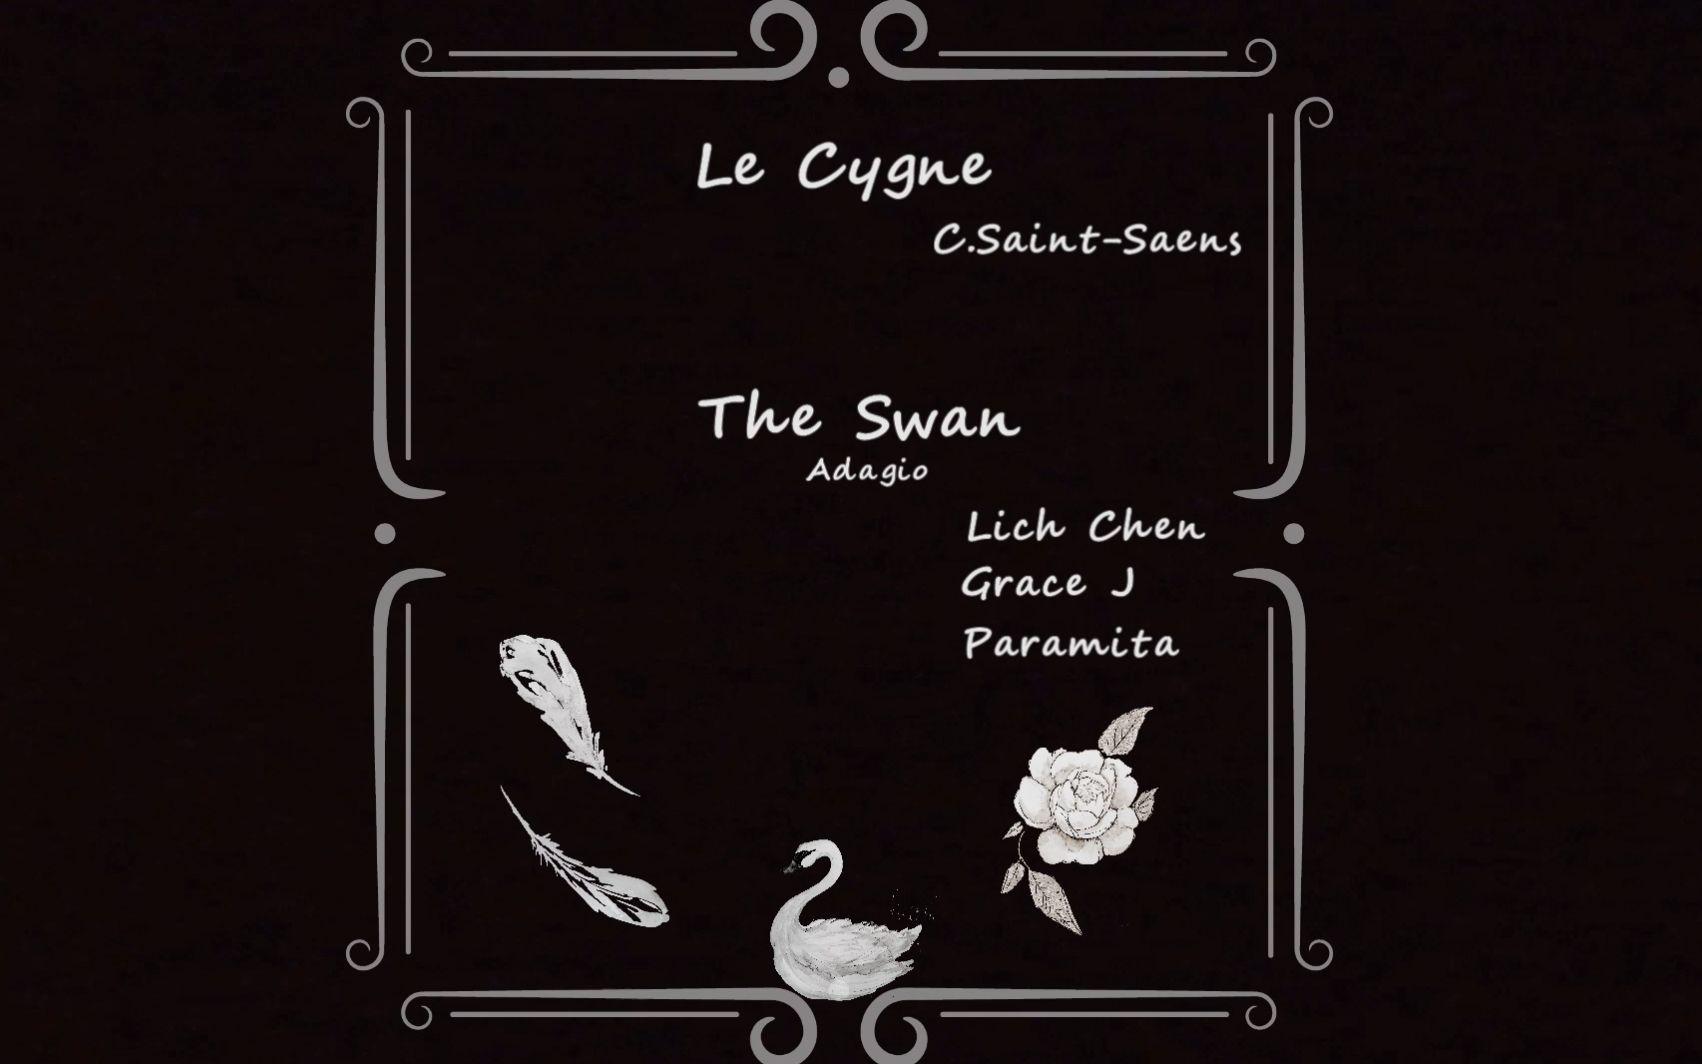 j  lita 演奏乐器: 钢琴 小提琴  简介补充: the swan 天鹅 圣桑 评论图片